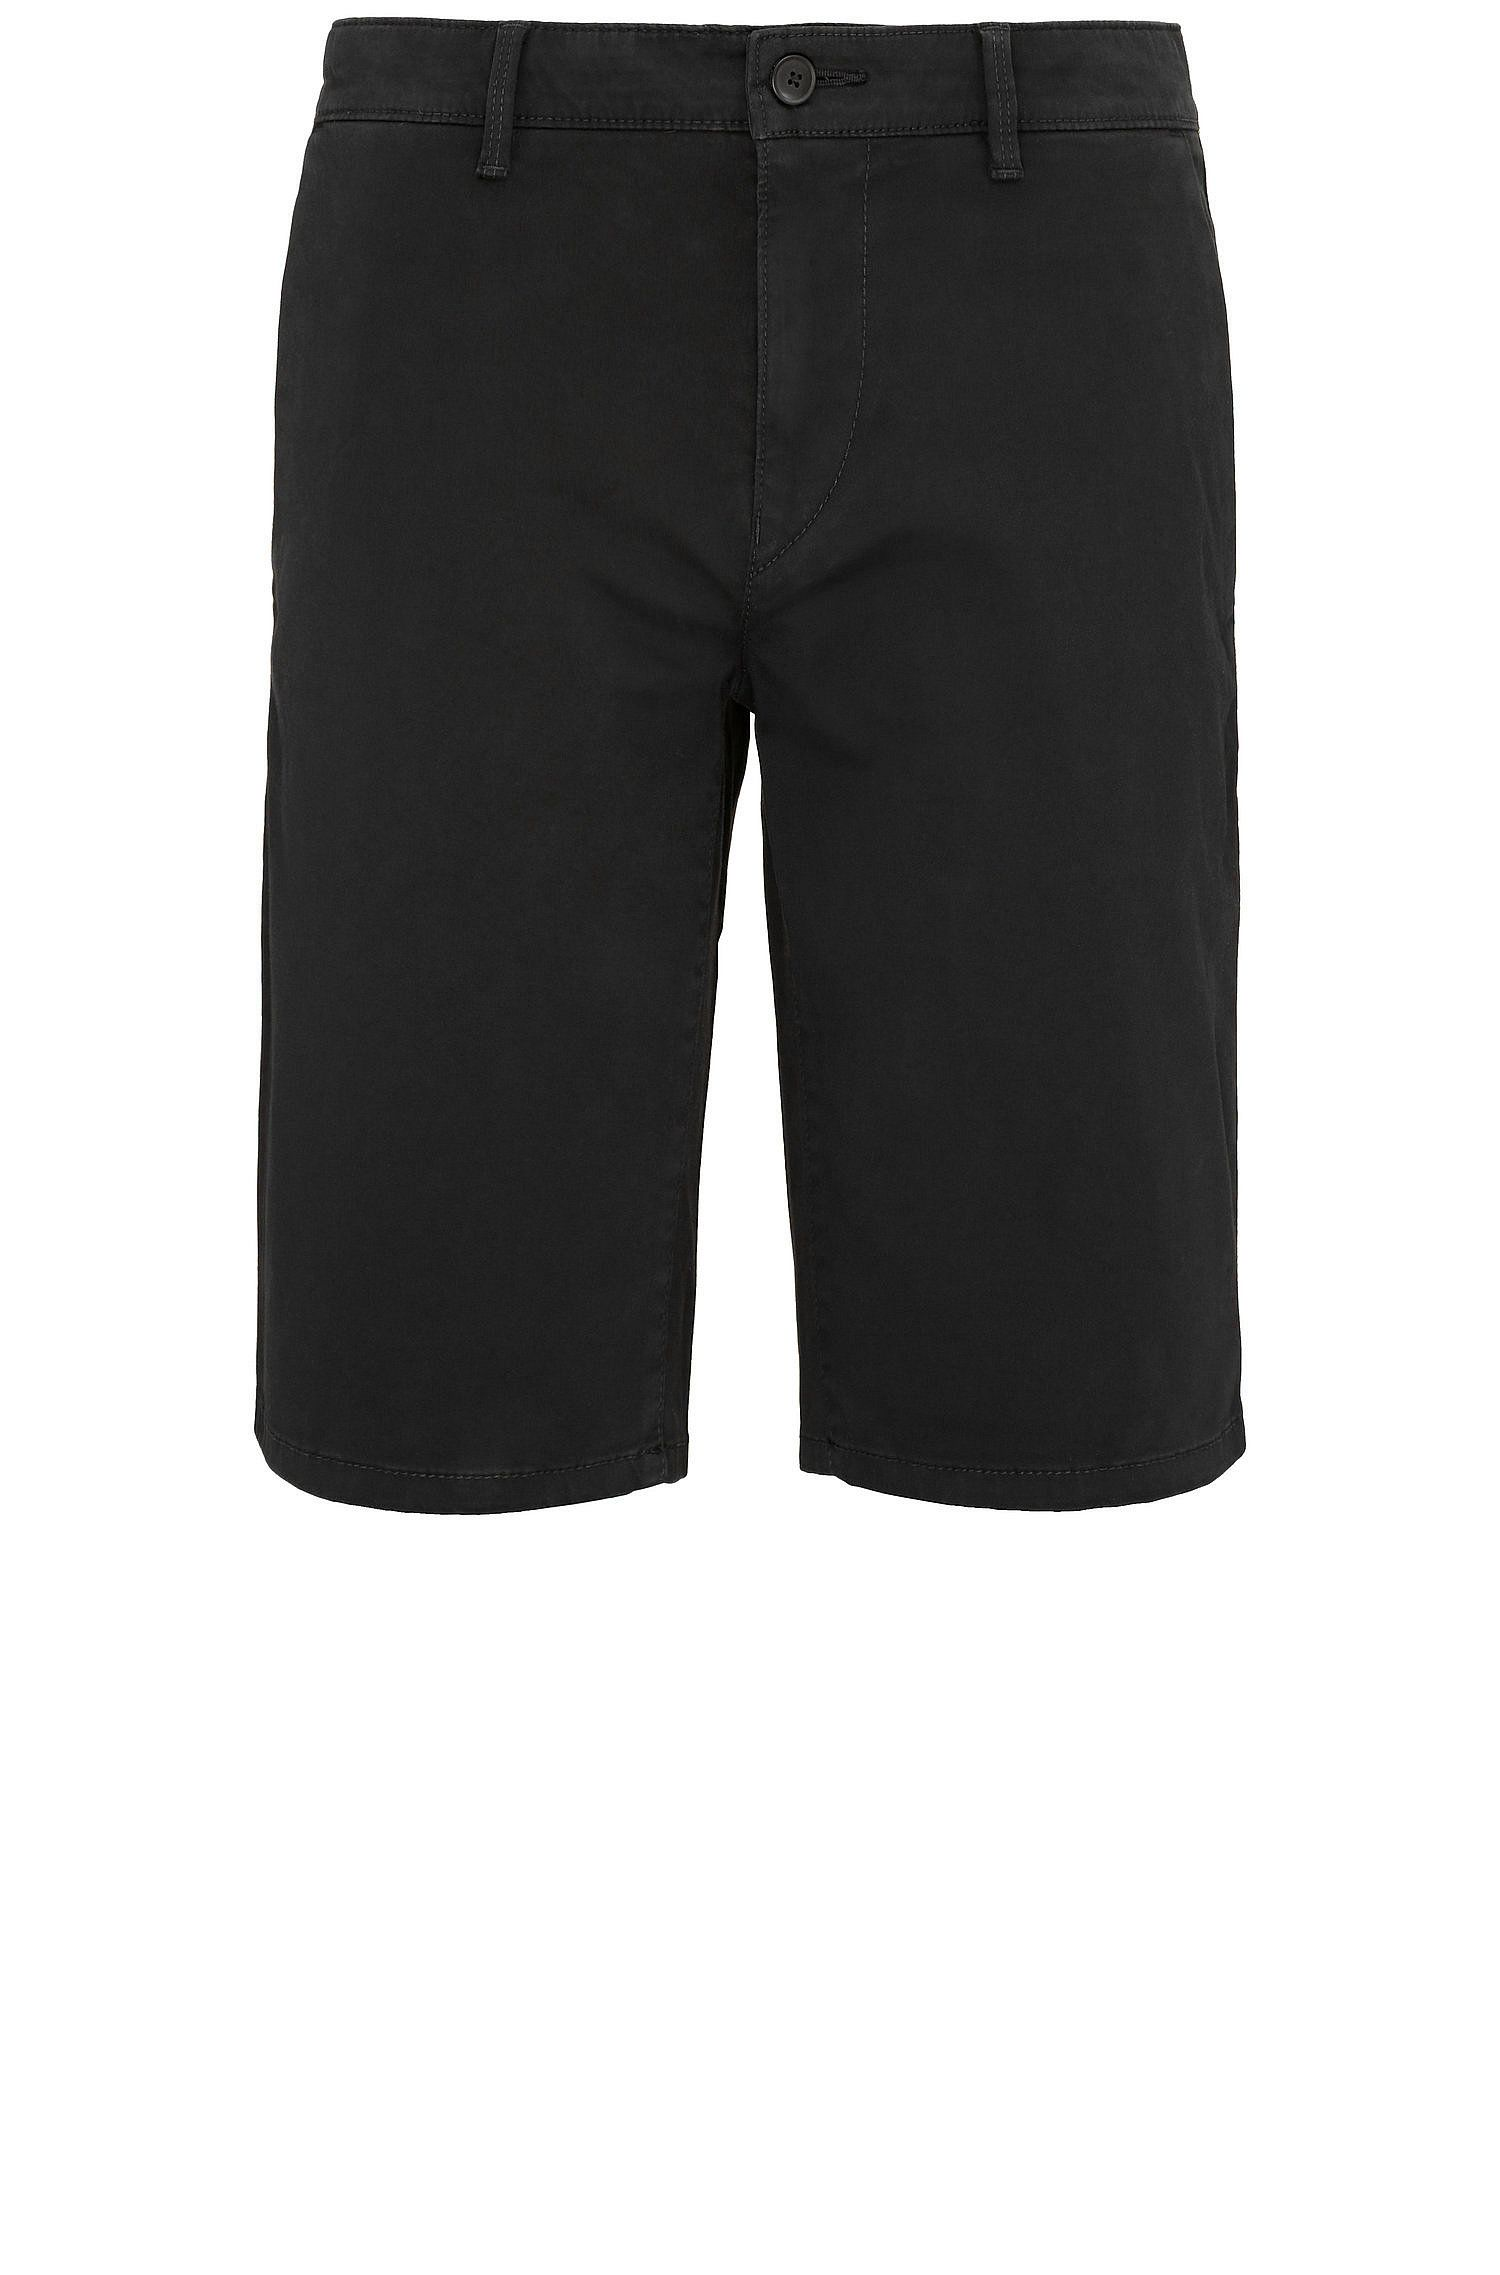 Short Slim Fit en coton stretch de style chino: «Schino-Slim-Shorts-D»